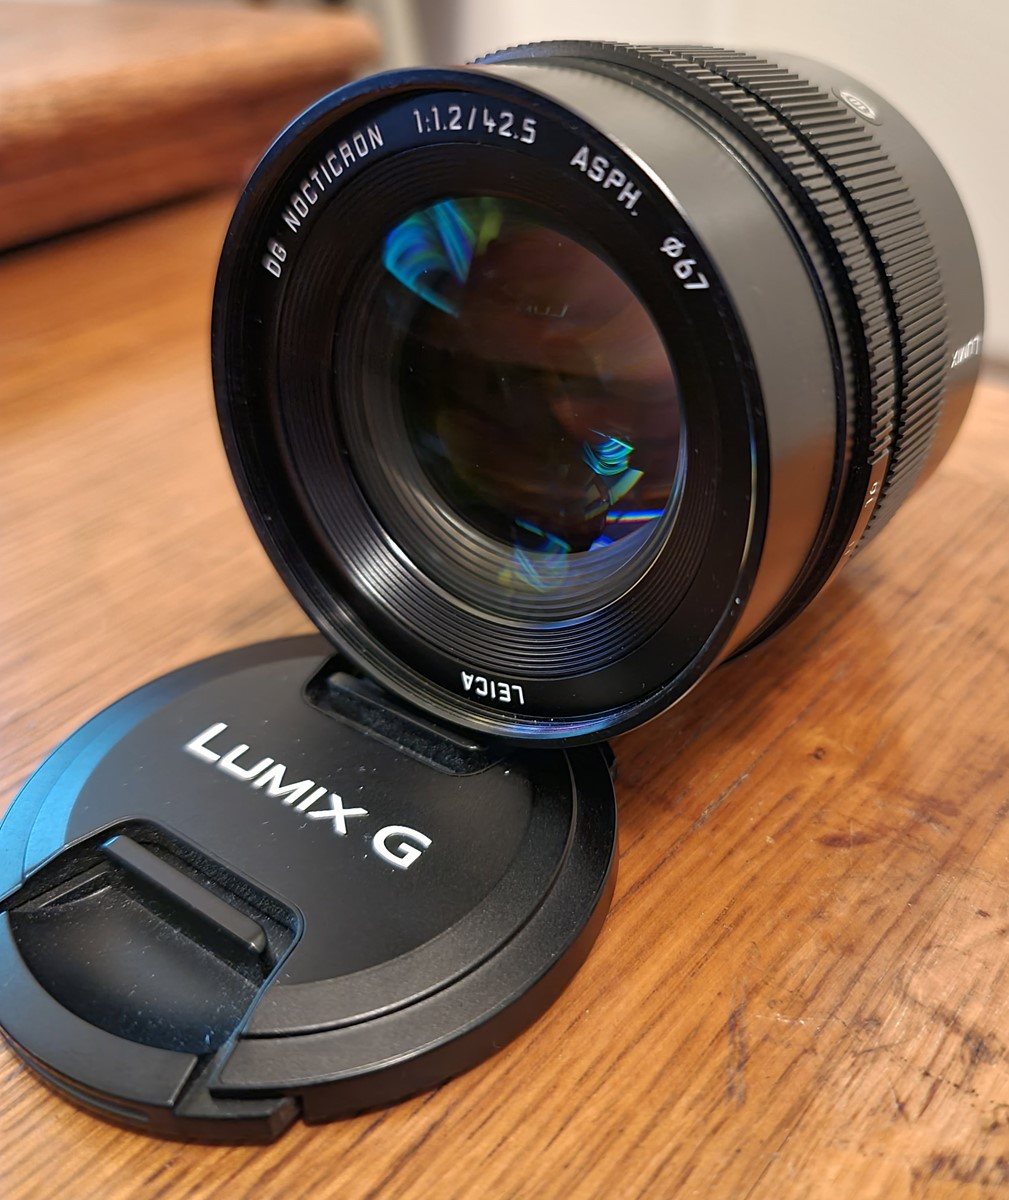 Leica DG Nocticron 42,5mm f/1,2 ASPH Power O.I.S